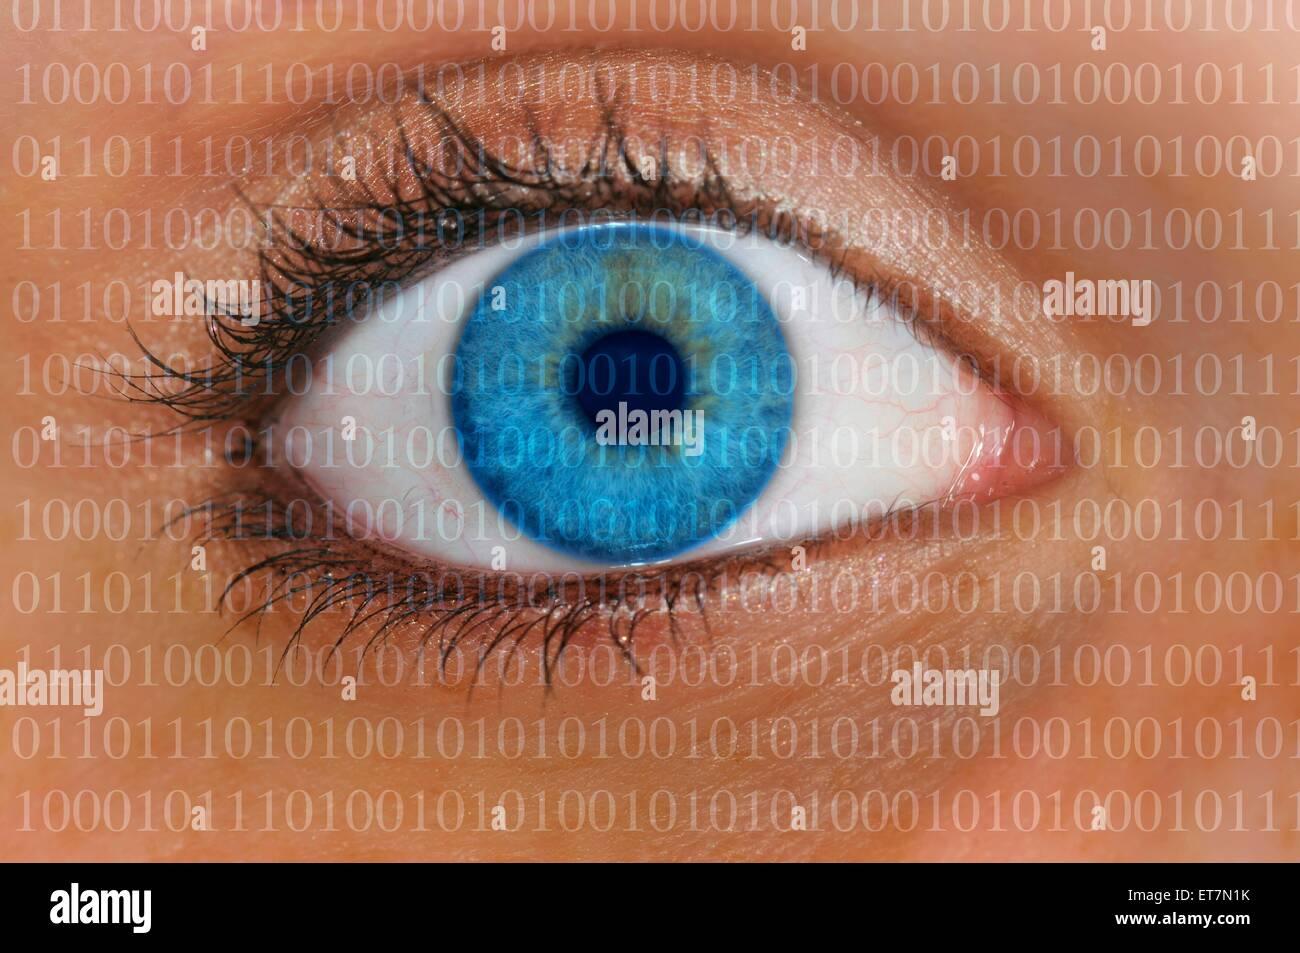 Detailaufnahme Auge mit Iris, Zahlenkolonnen Symbolbild personenbezogener Daten Speicherung als   eye et des colonnes de chiffres, sy Banque D'Images